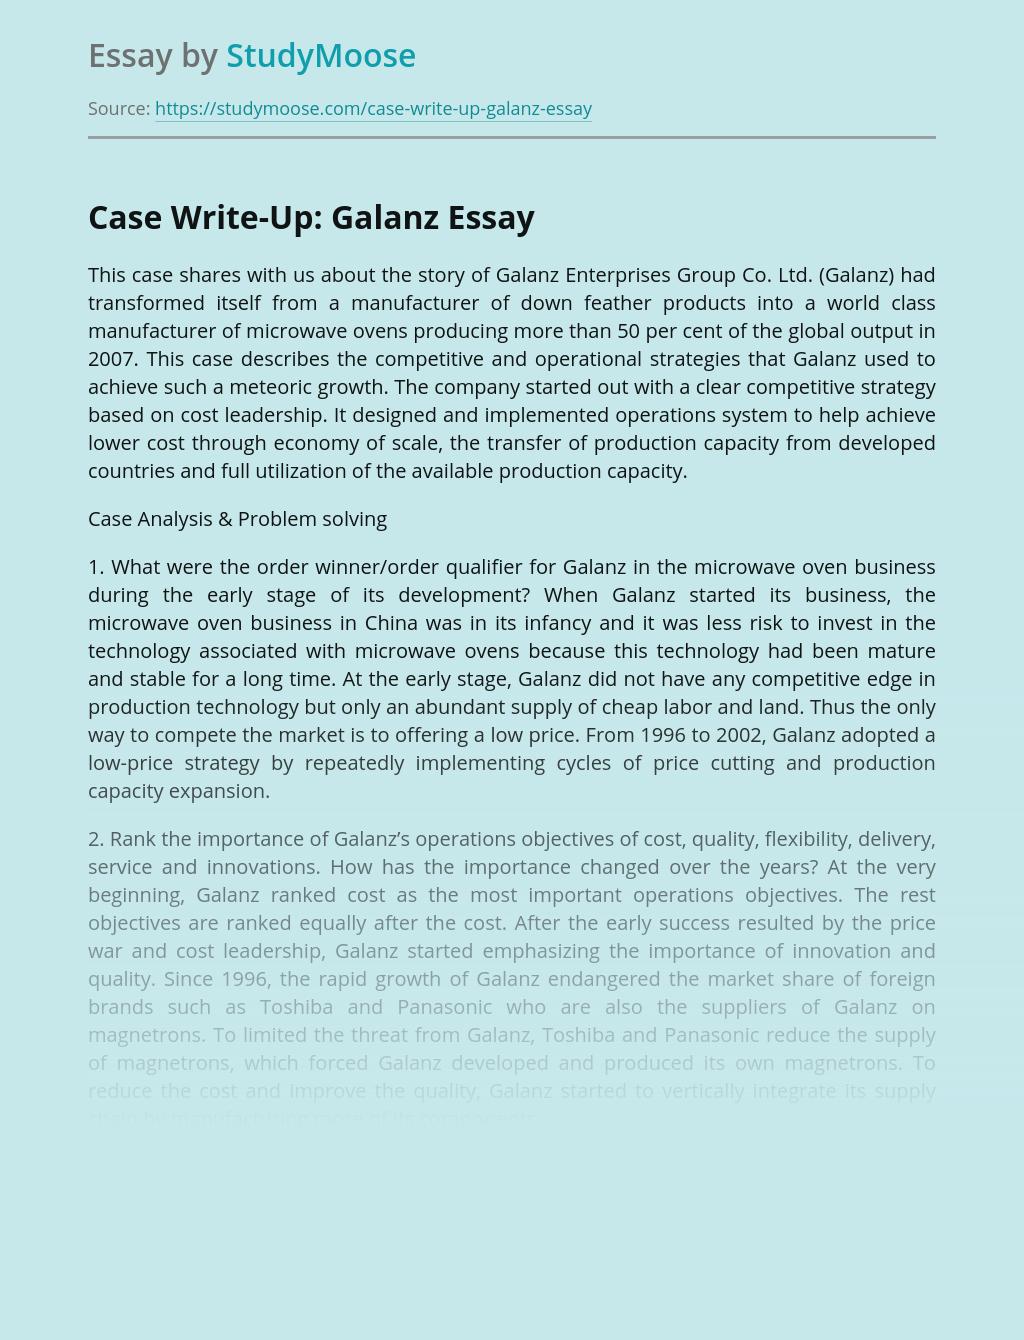 Case Write-Up: Galanz